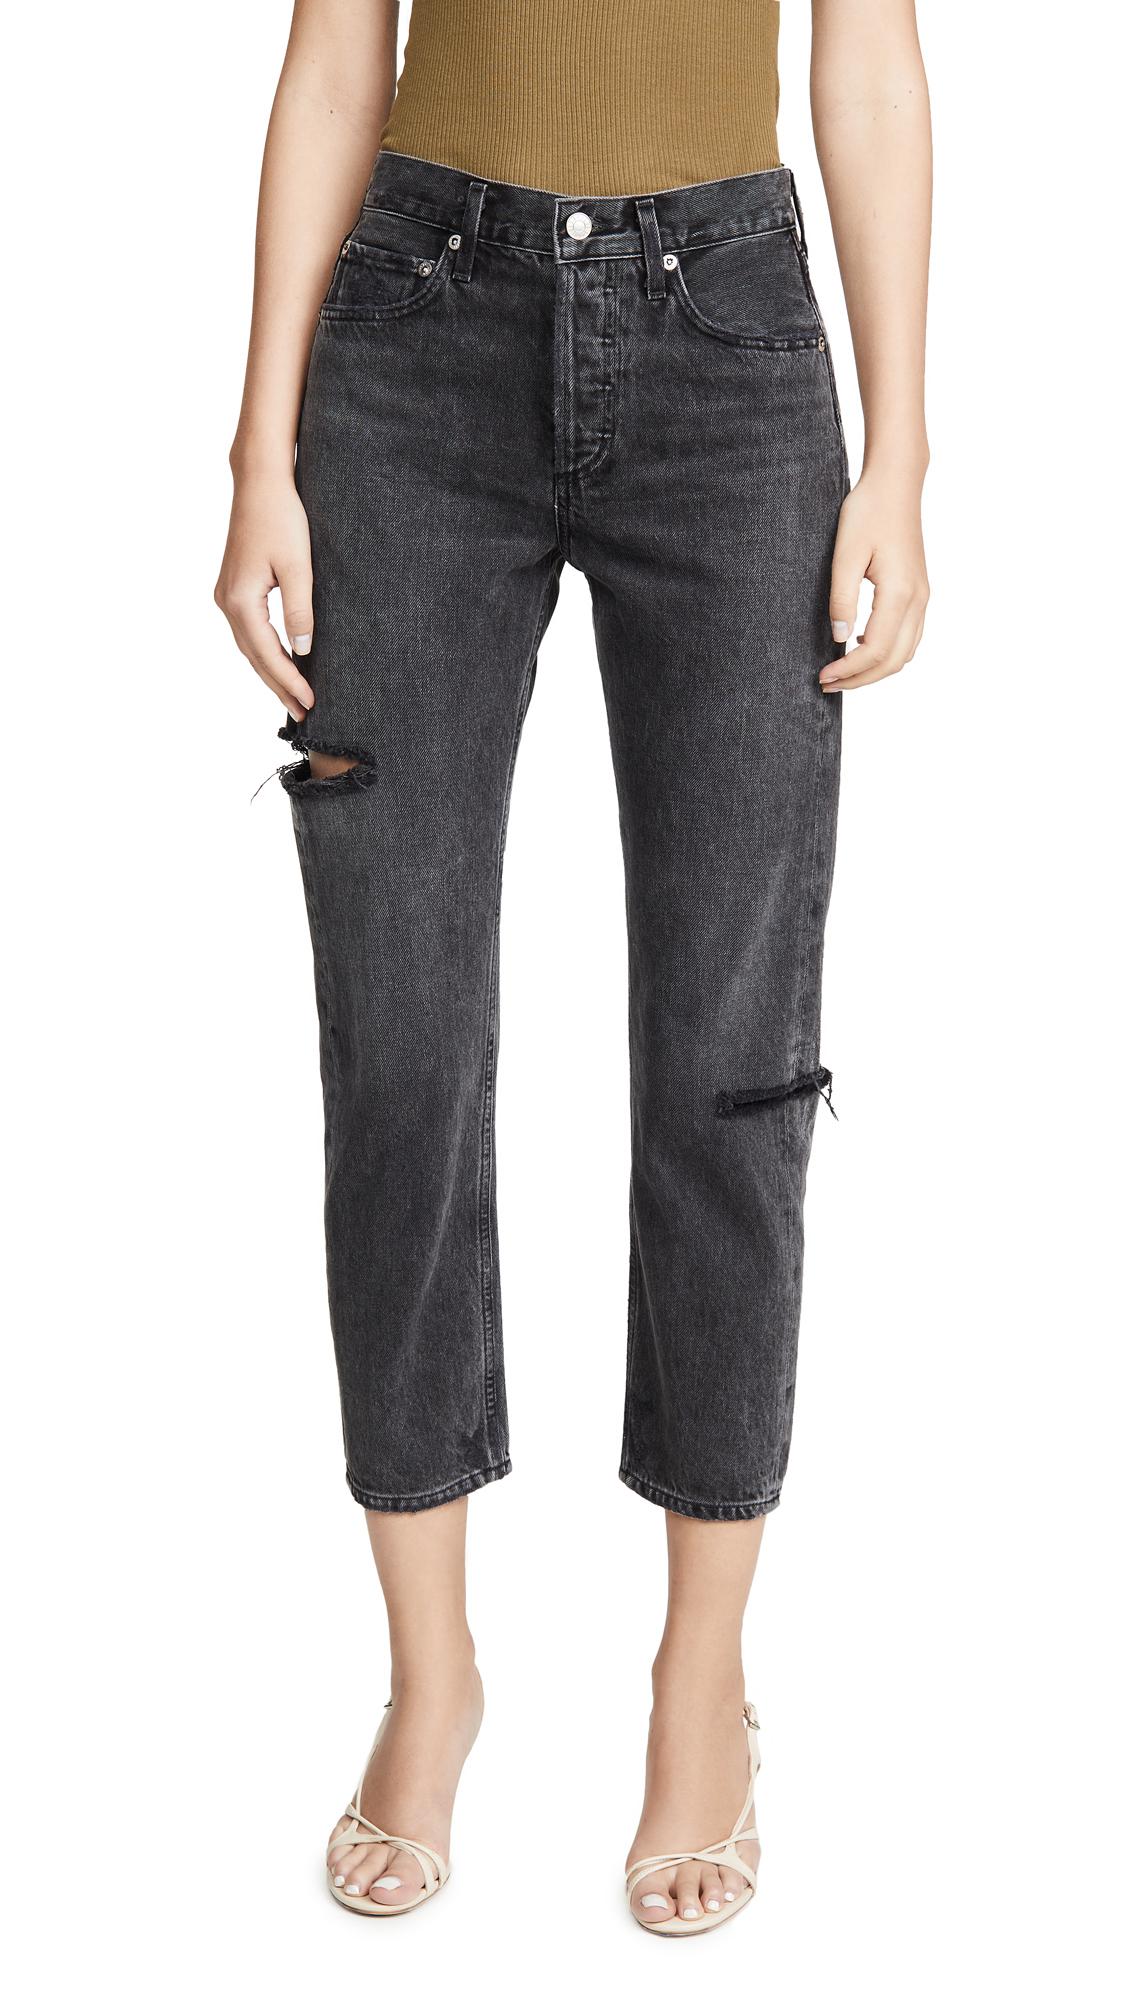 AGOLDE Parker Easy Straight Jeans - Sense